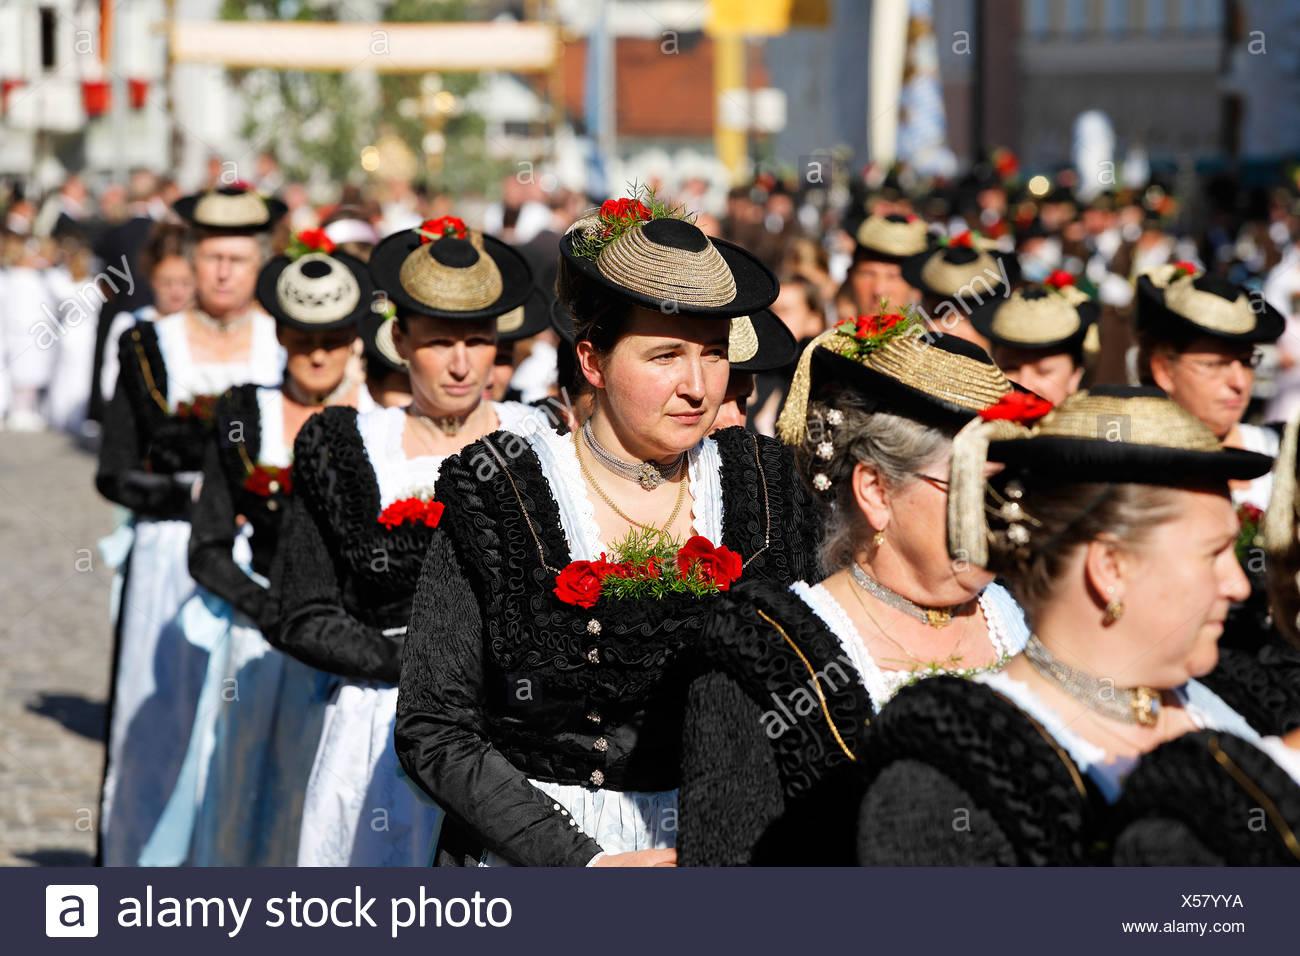 Feast of Corpus Christi procession in Bad Toelz, Upper Bavaria Germany - Stock Image